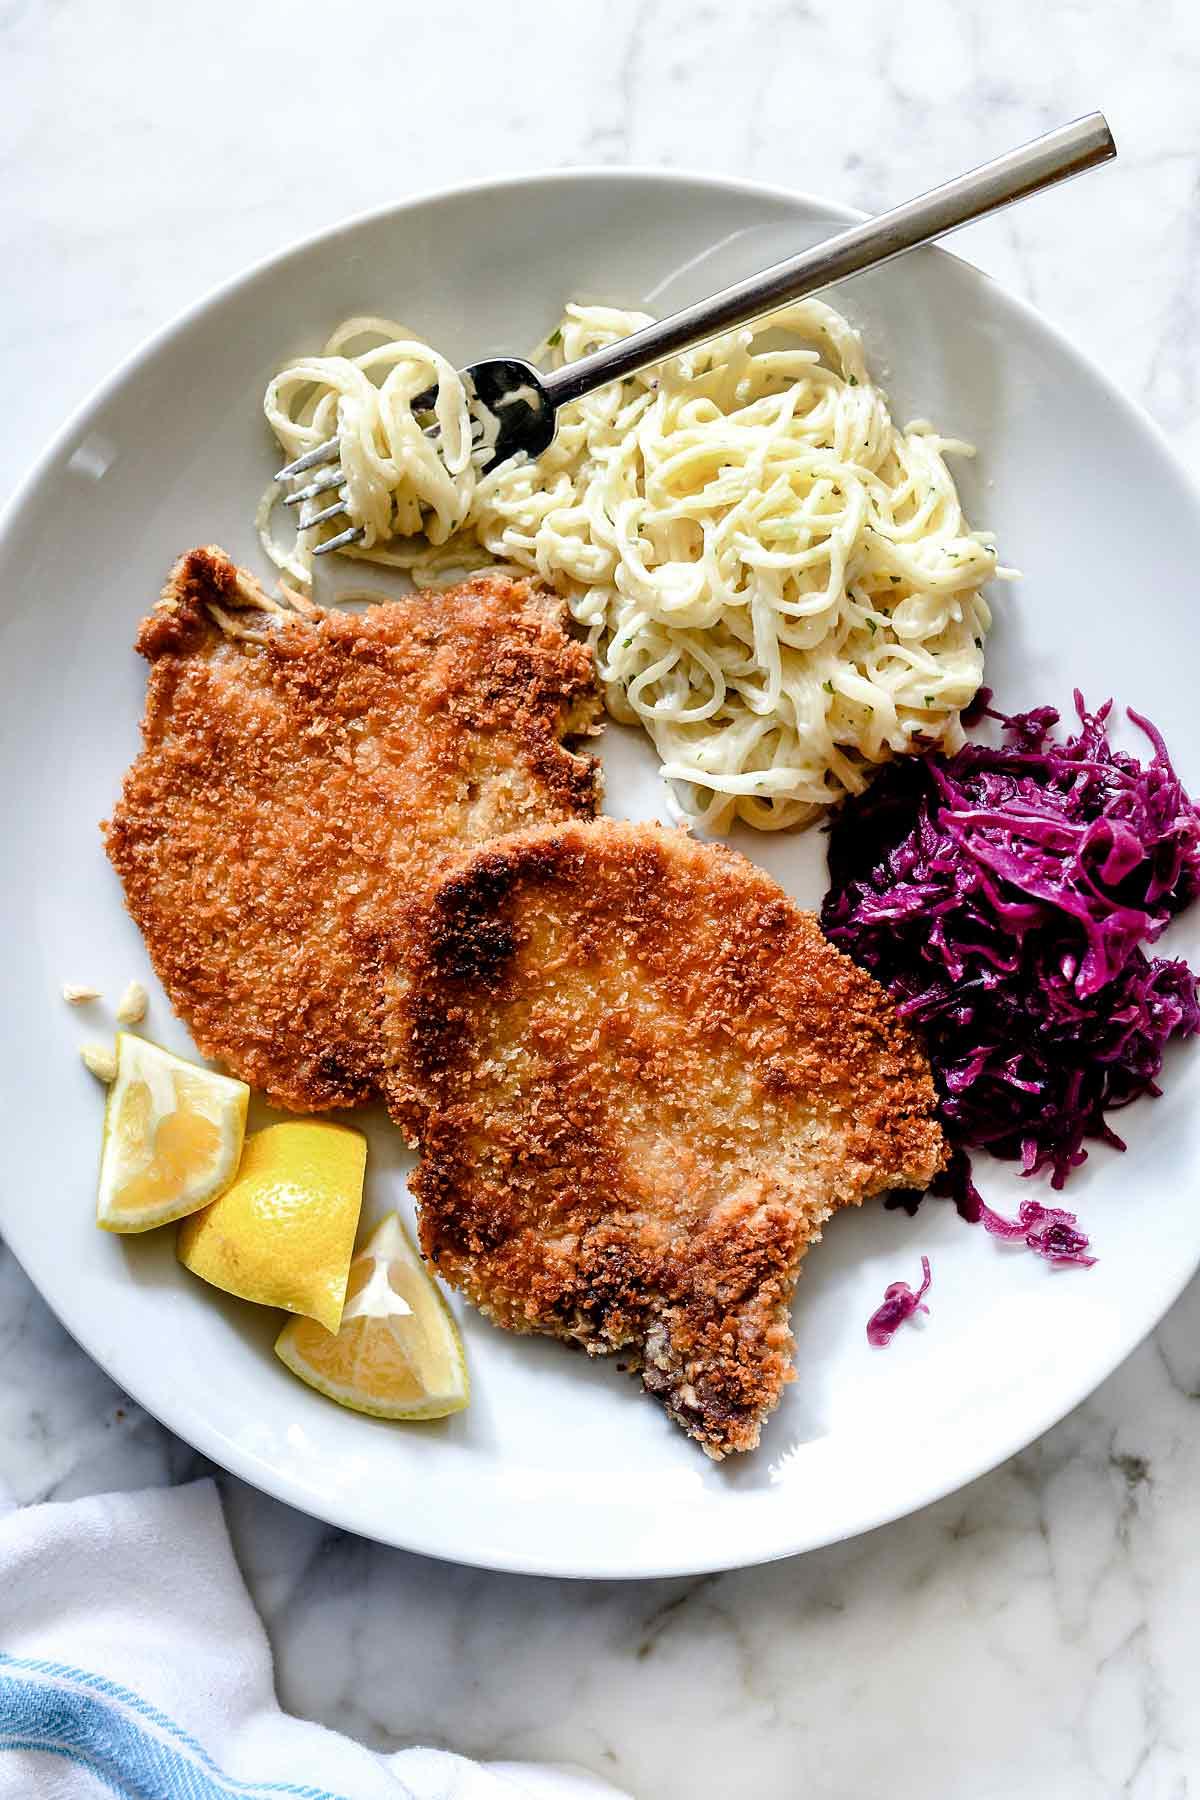 My Grandma's Easy German Schnitzel Recipe